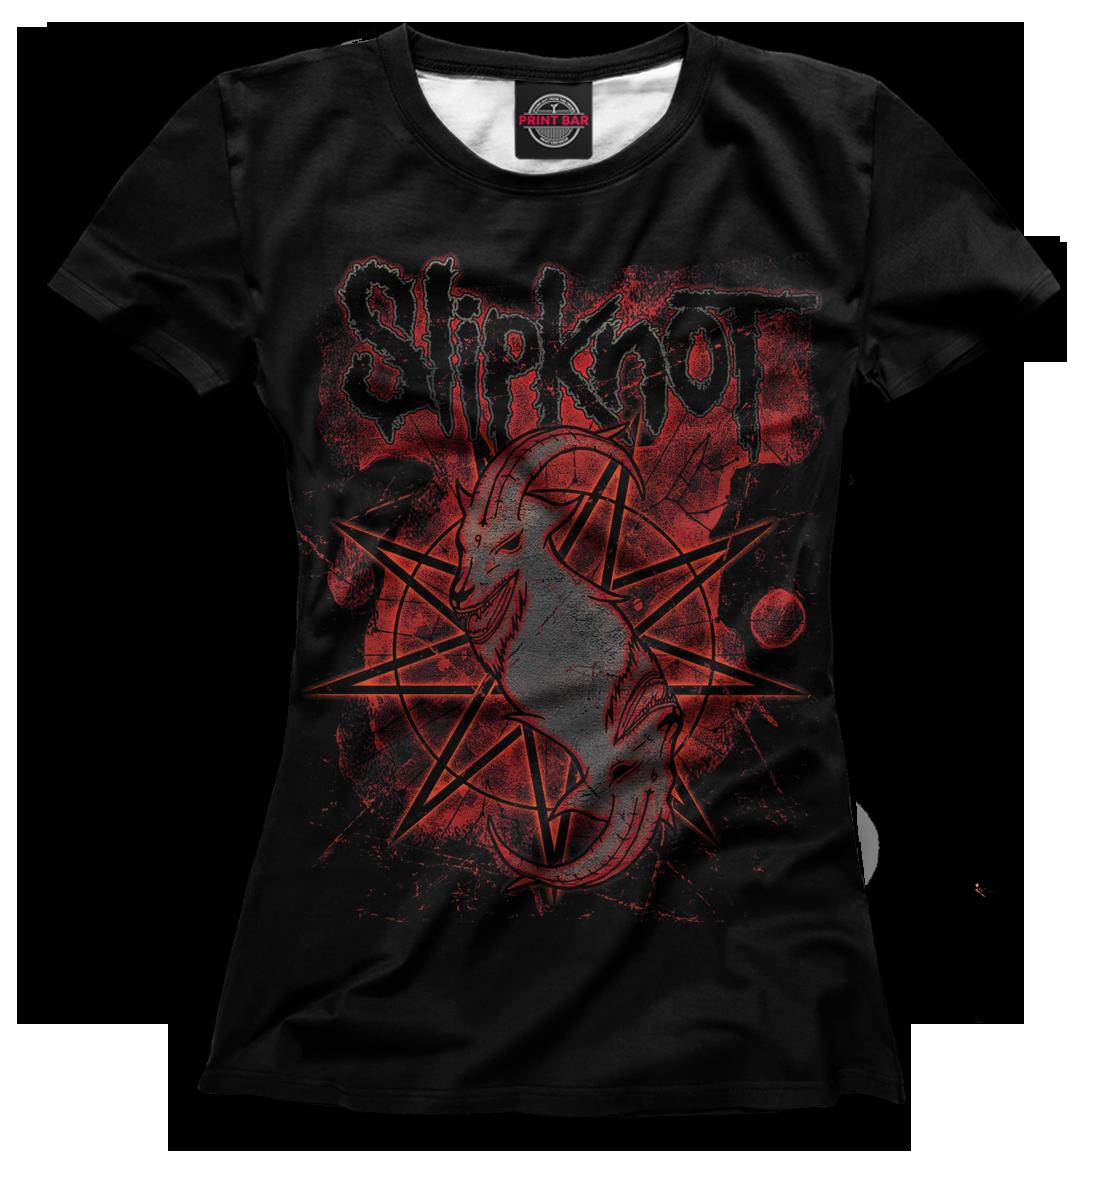 Купить Slipknot, Printbar, Футболки, SLI-286326-fut-1